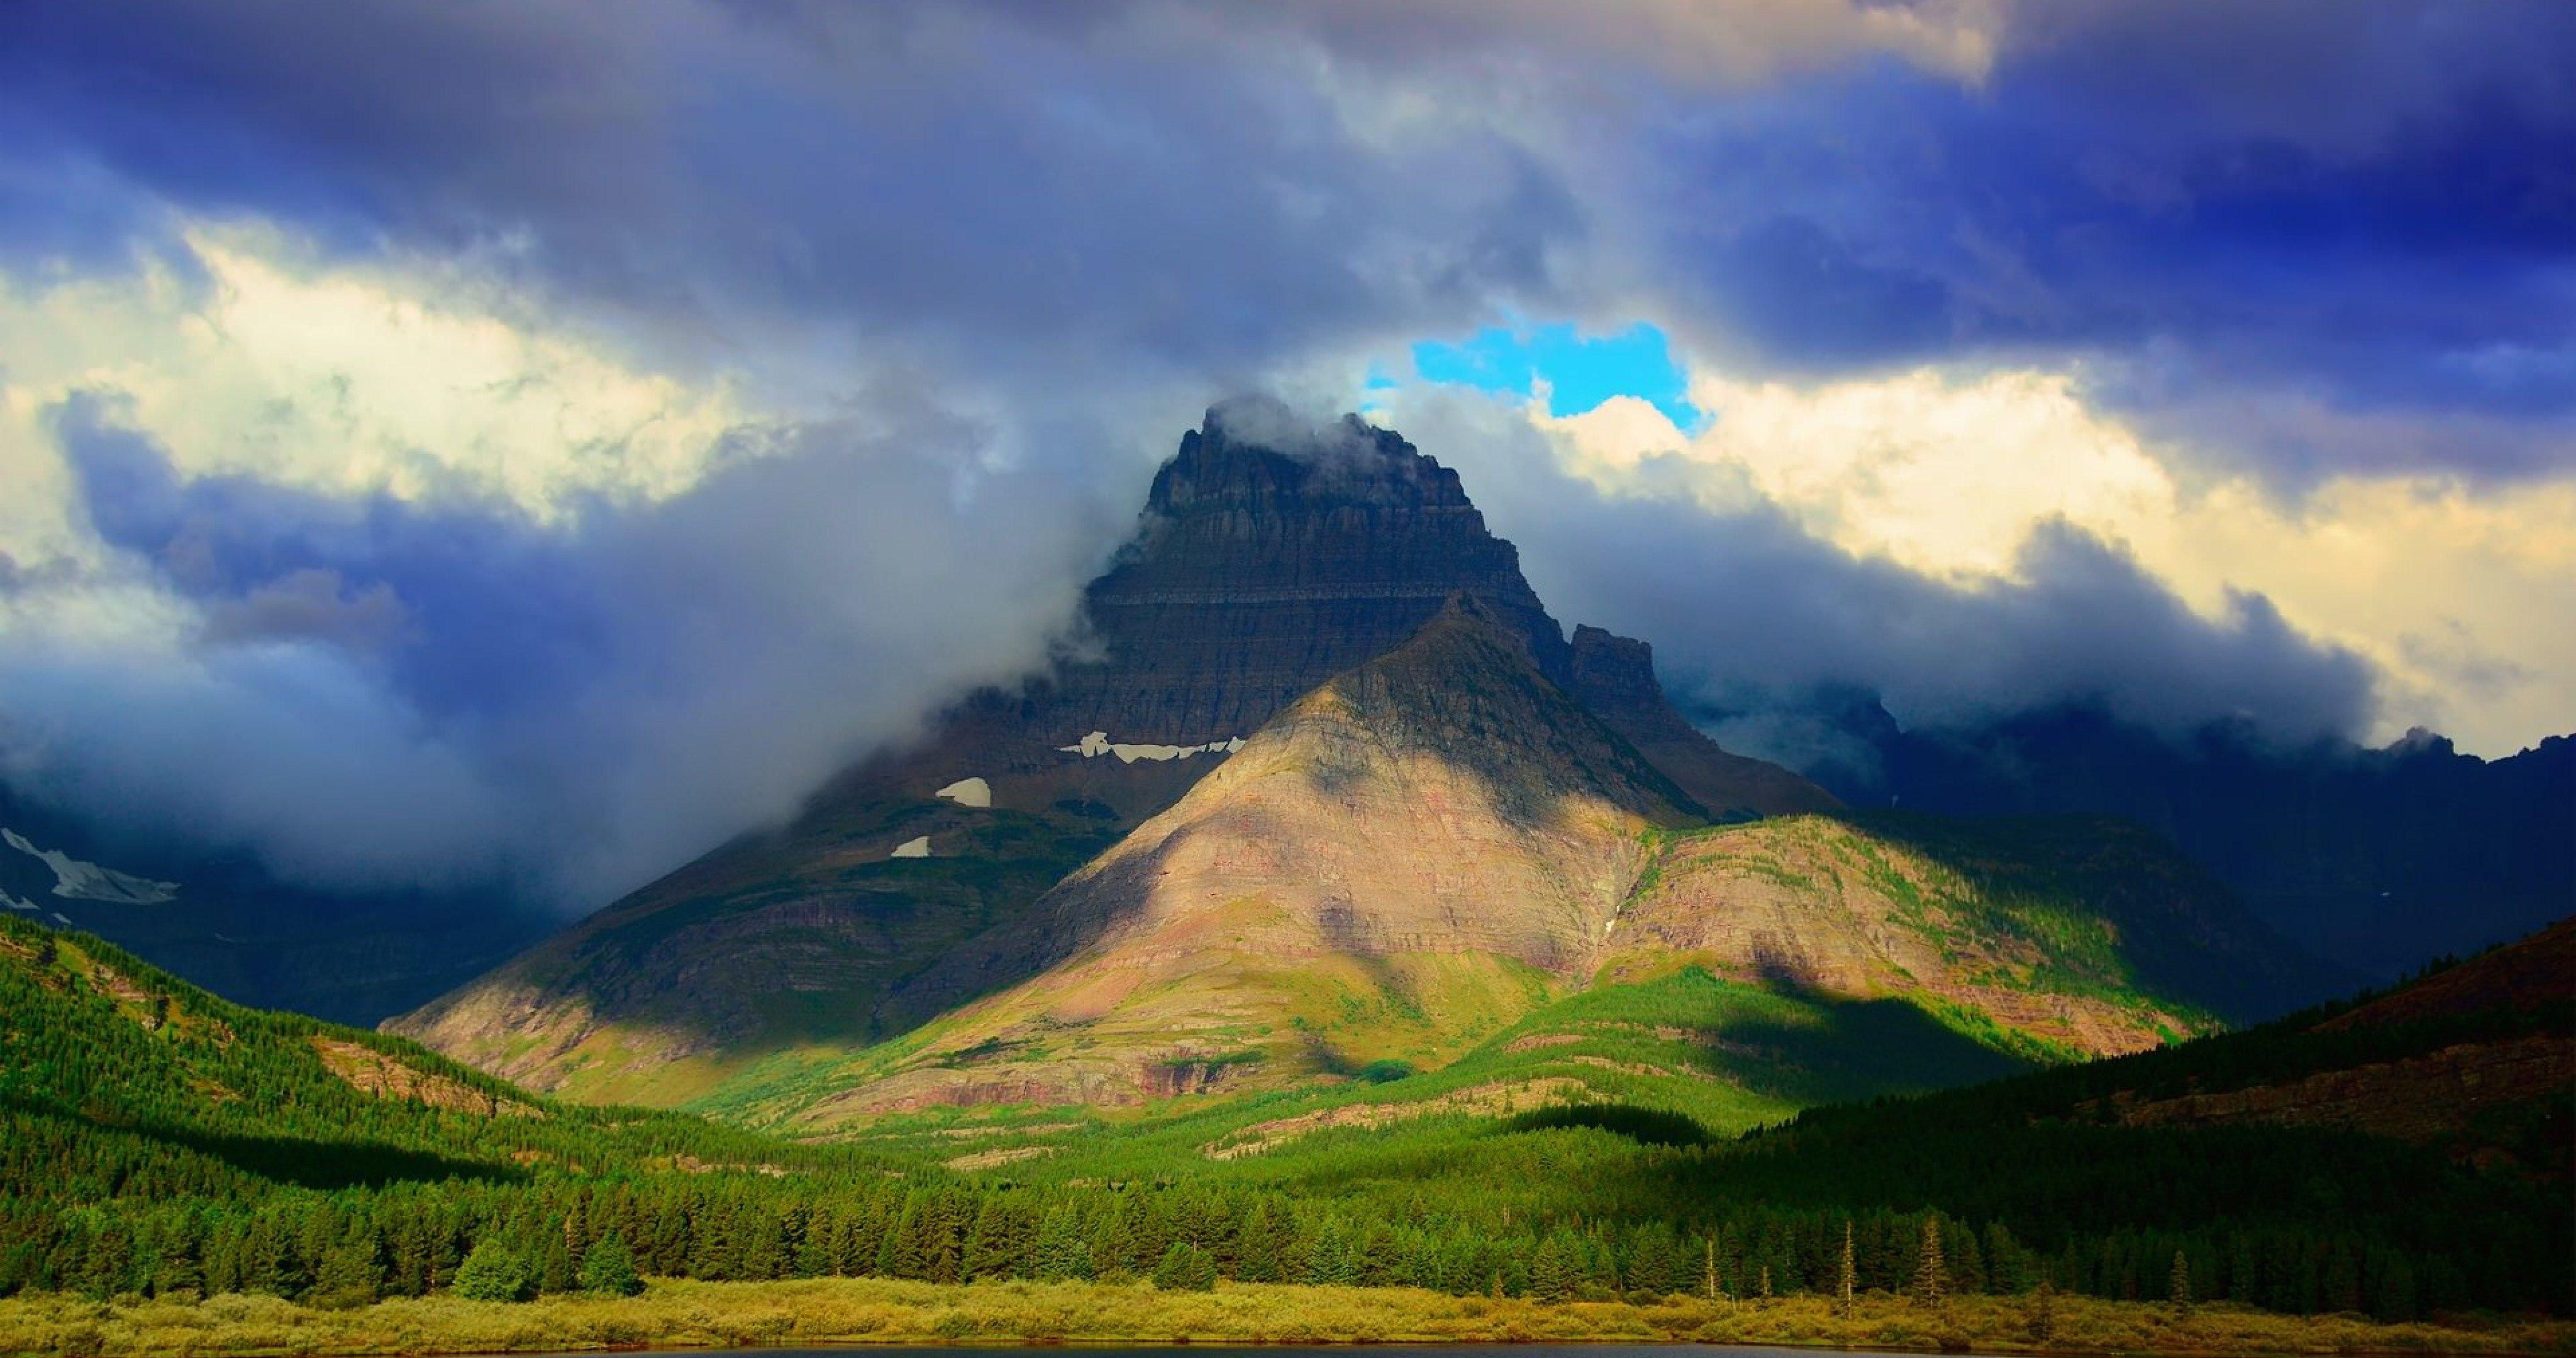 glacier national park usa 4k ultra hd wallpaper (With